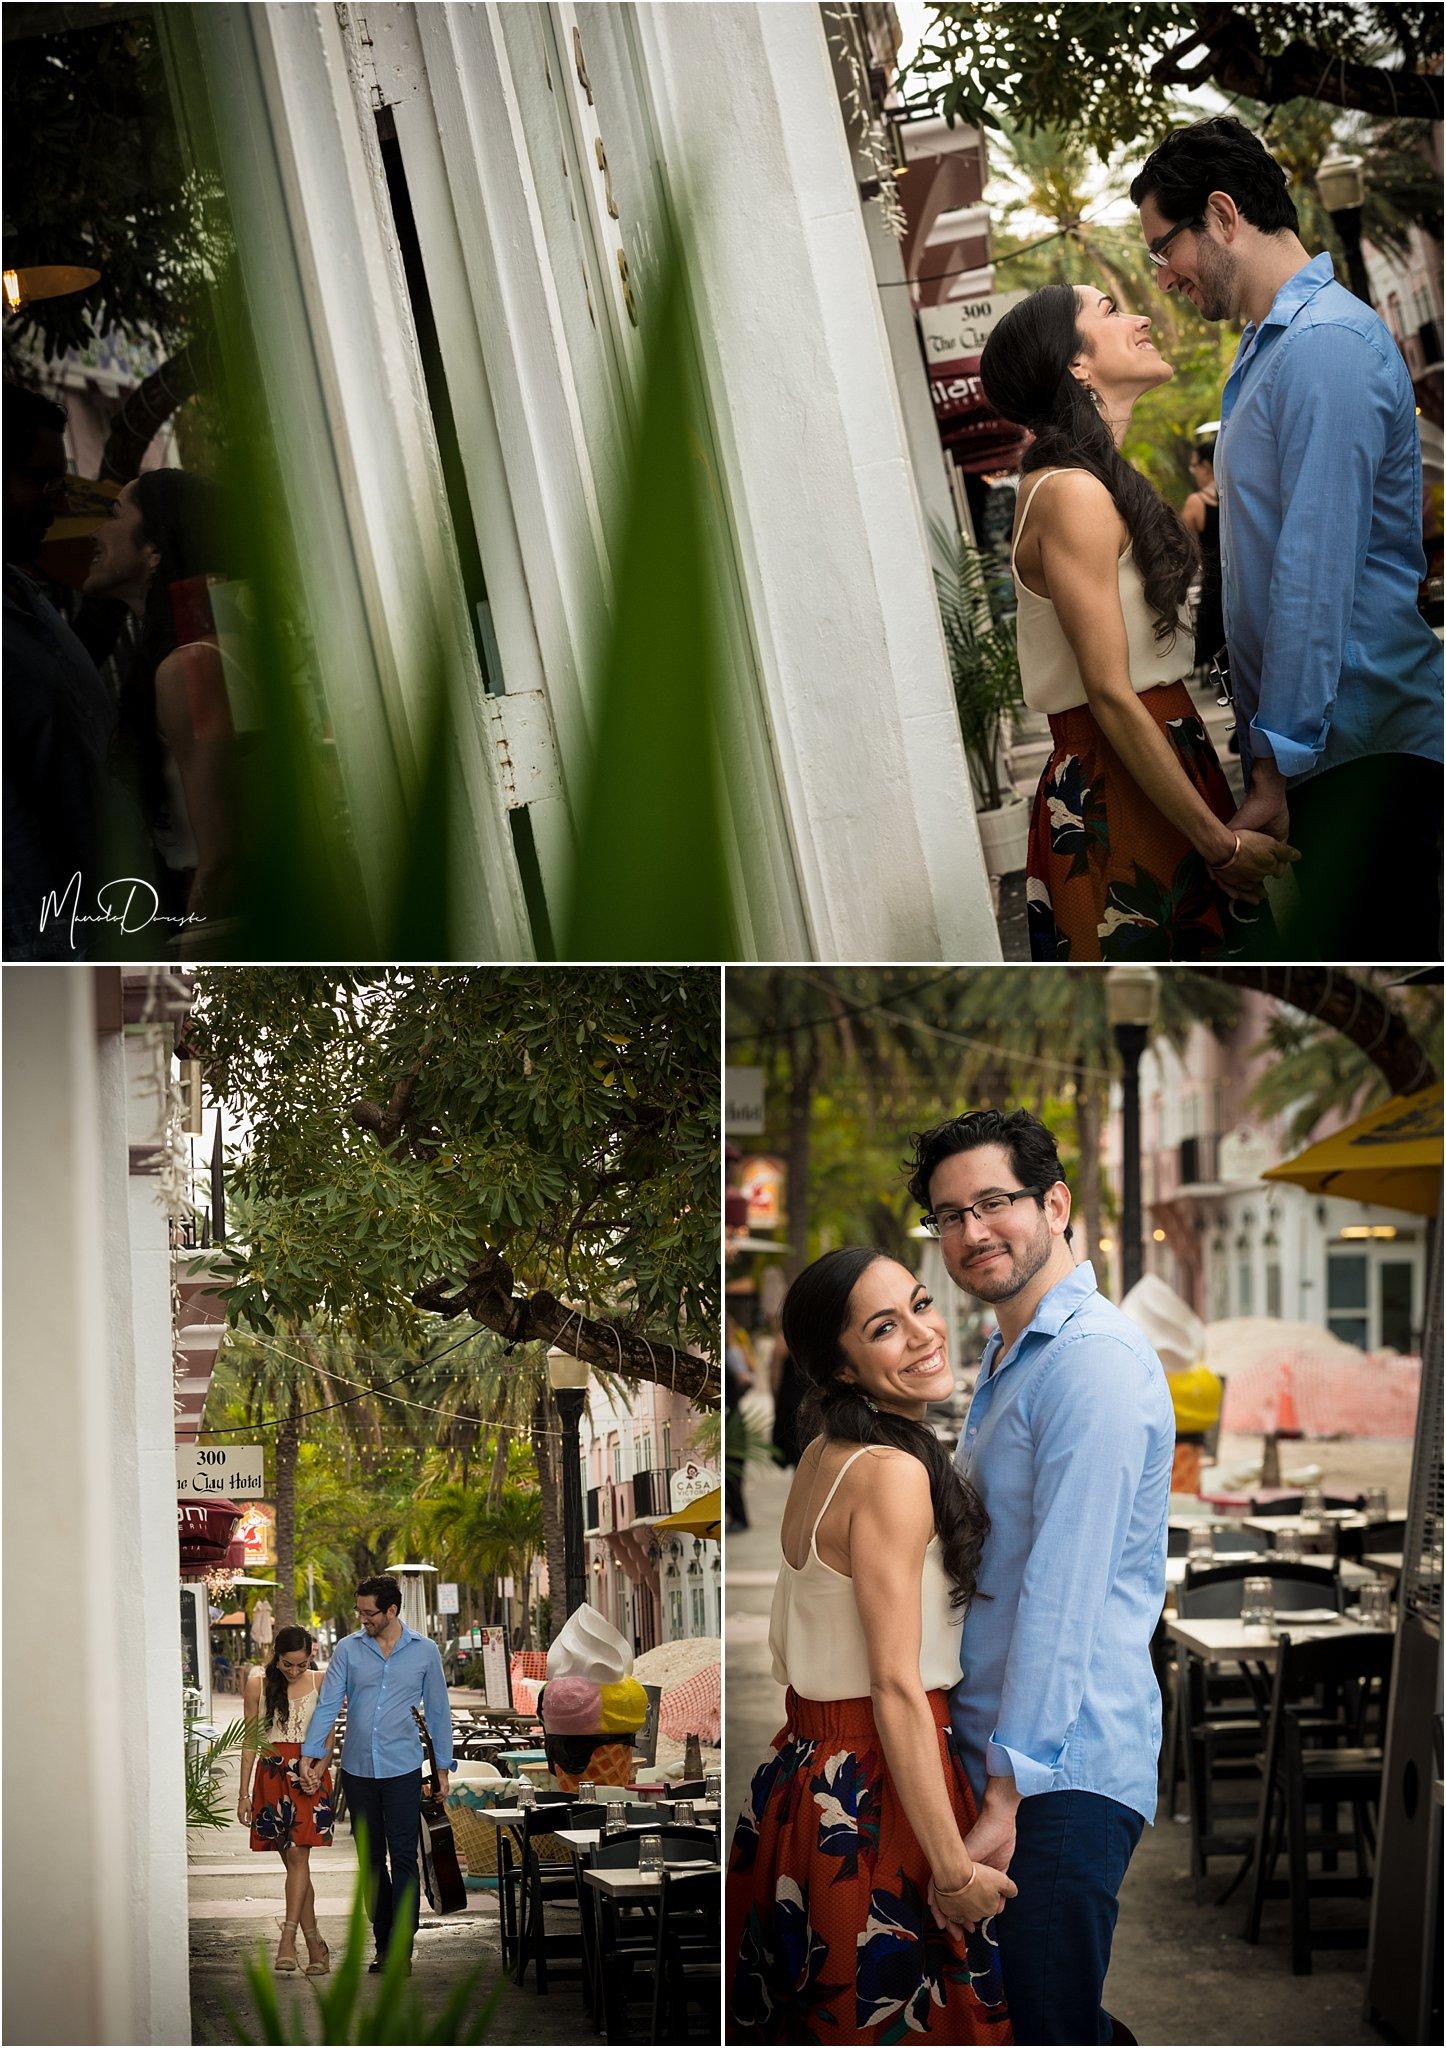 00773_ManoloDoreste_InFocusStudios_Wedding_Family_Photography_Miami_MiamiPhotographer.jpg